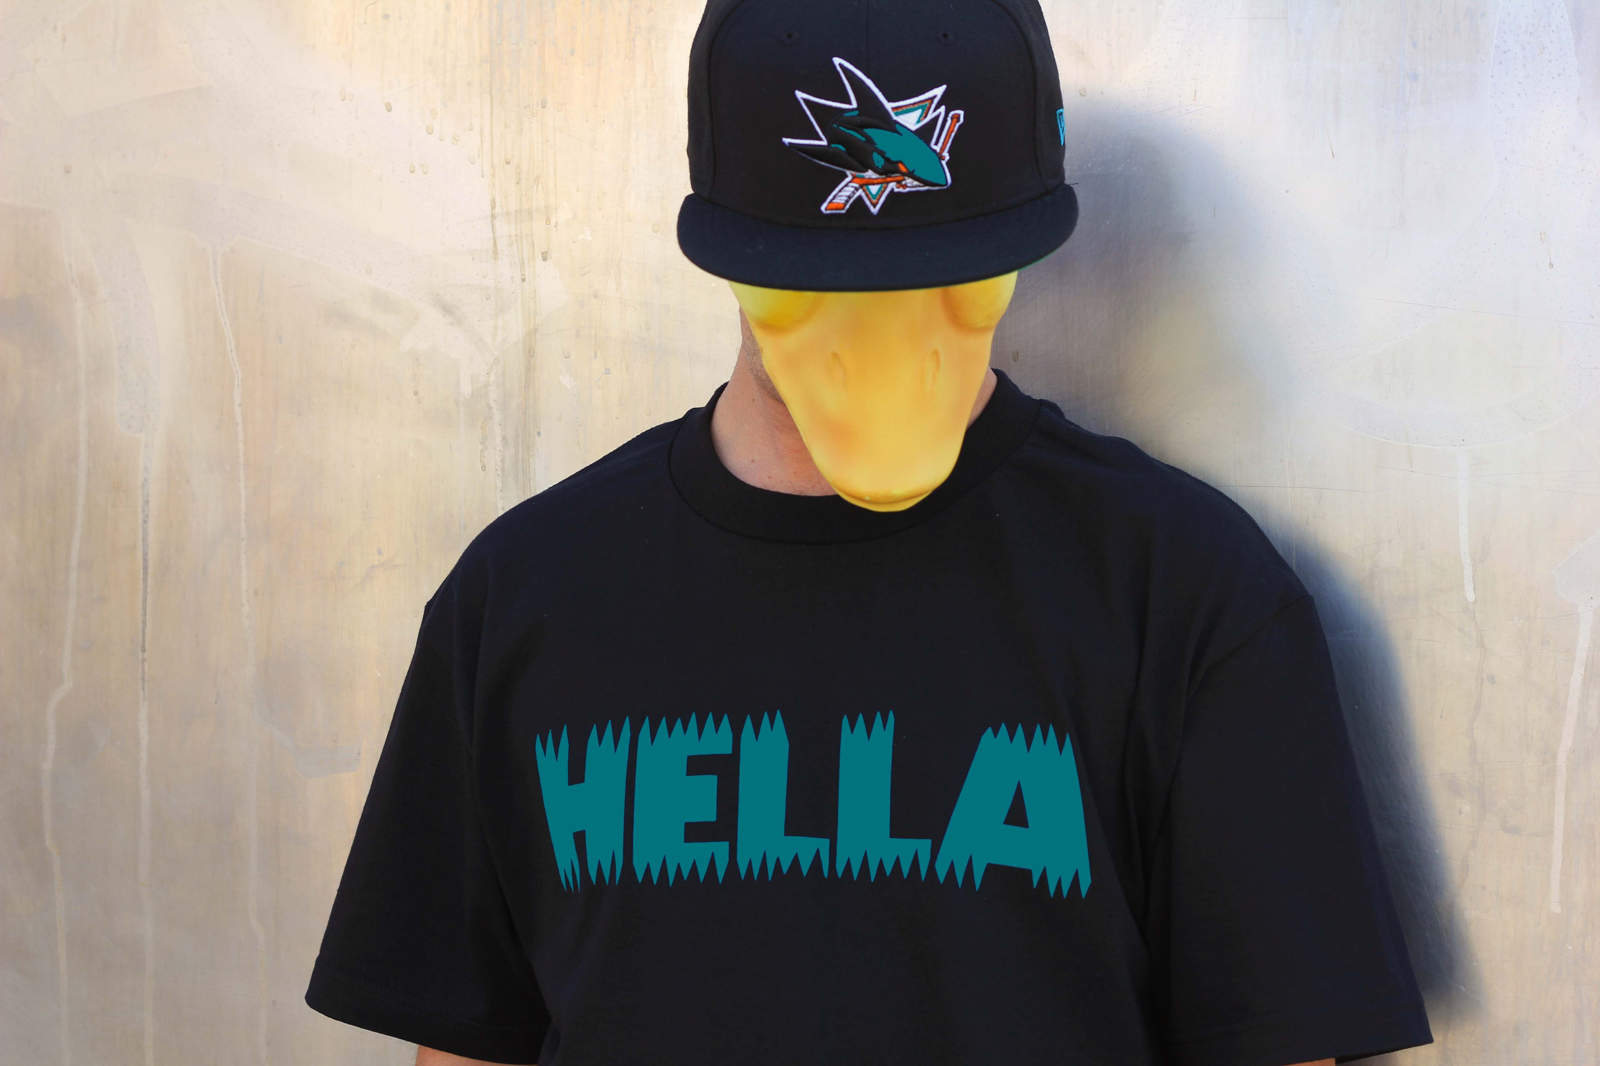 Hella - Sharks